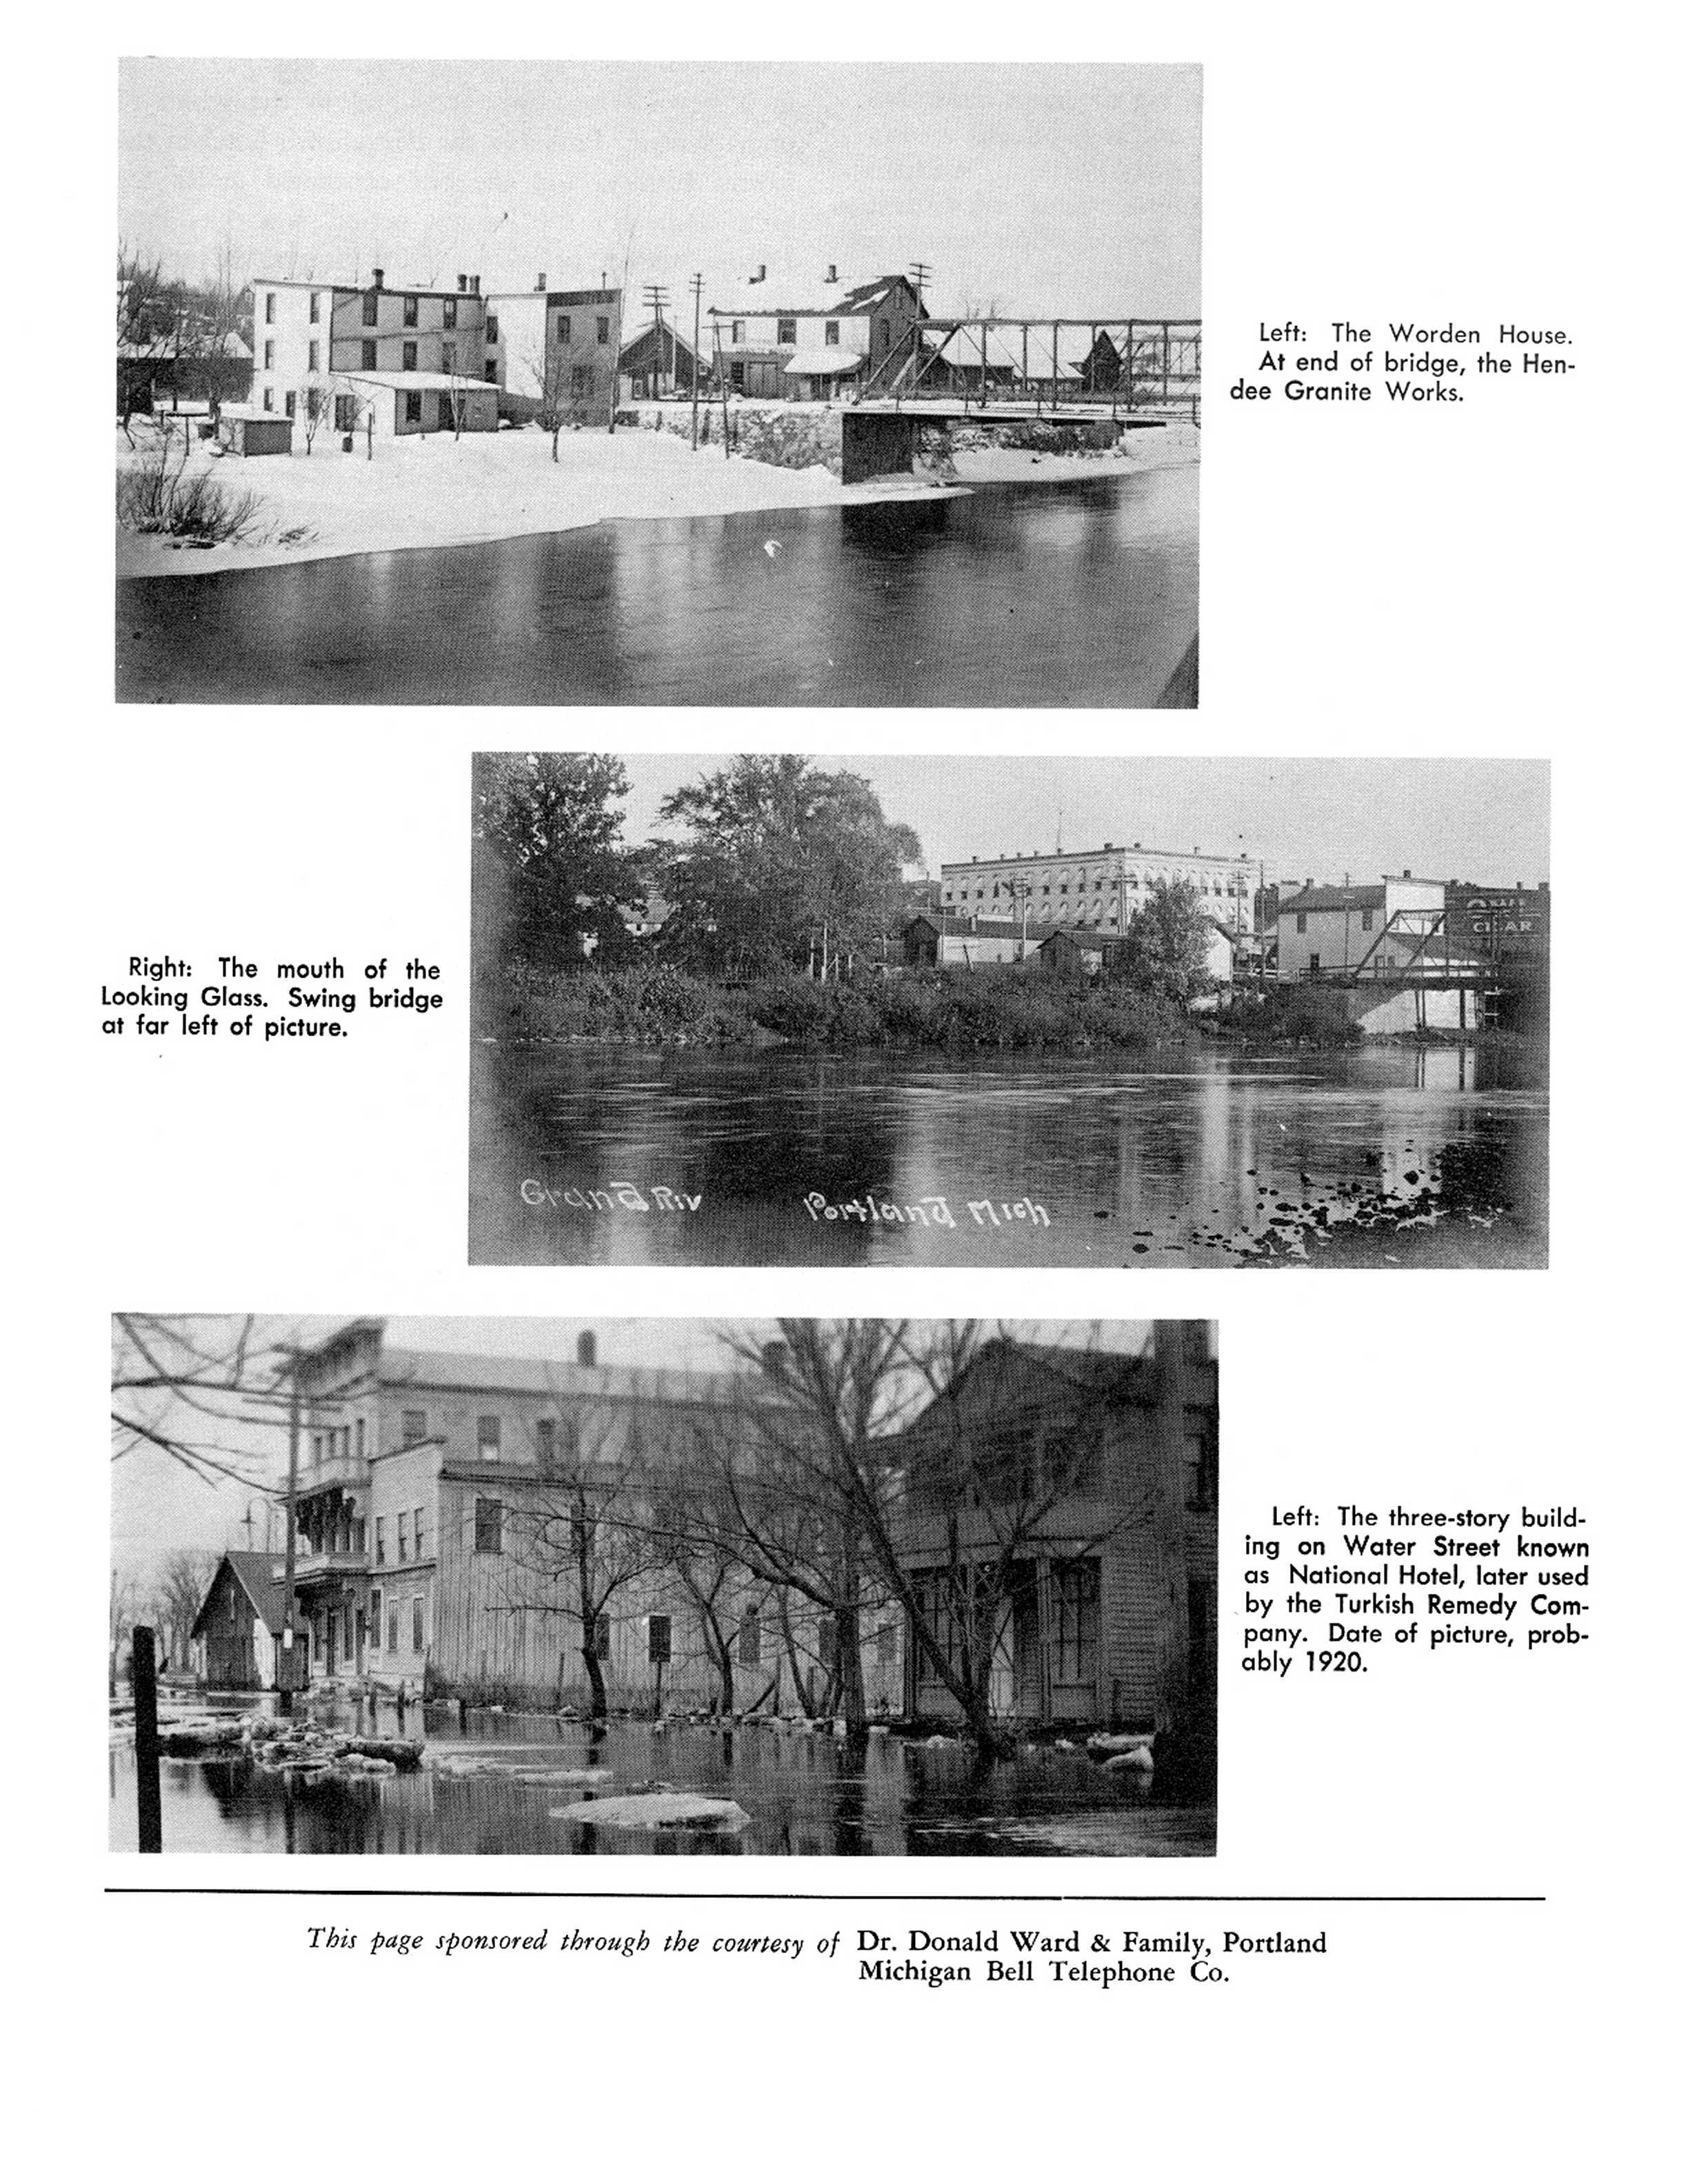 Portland Michigan Historical Resources Clarion Hotel